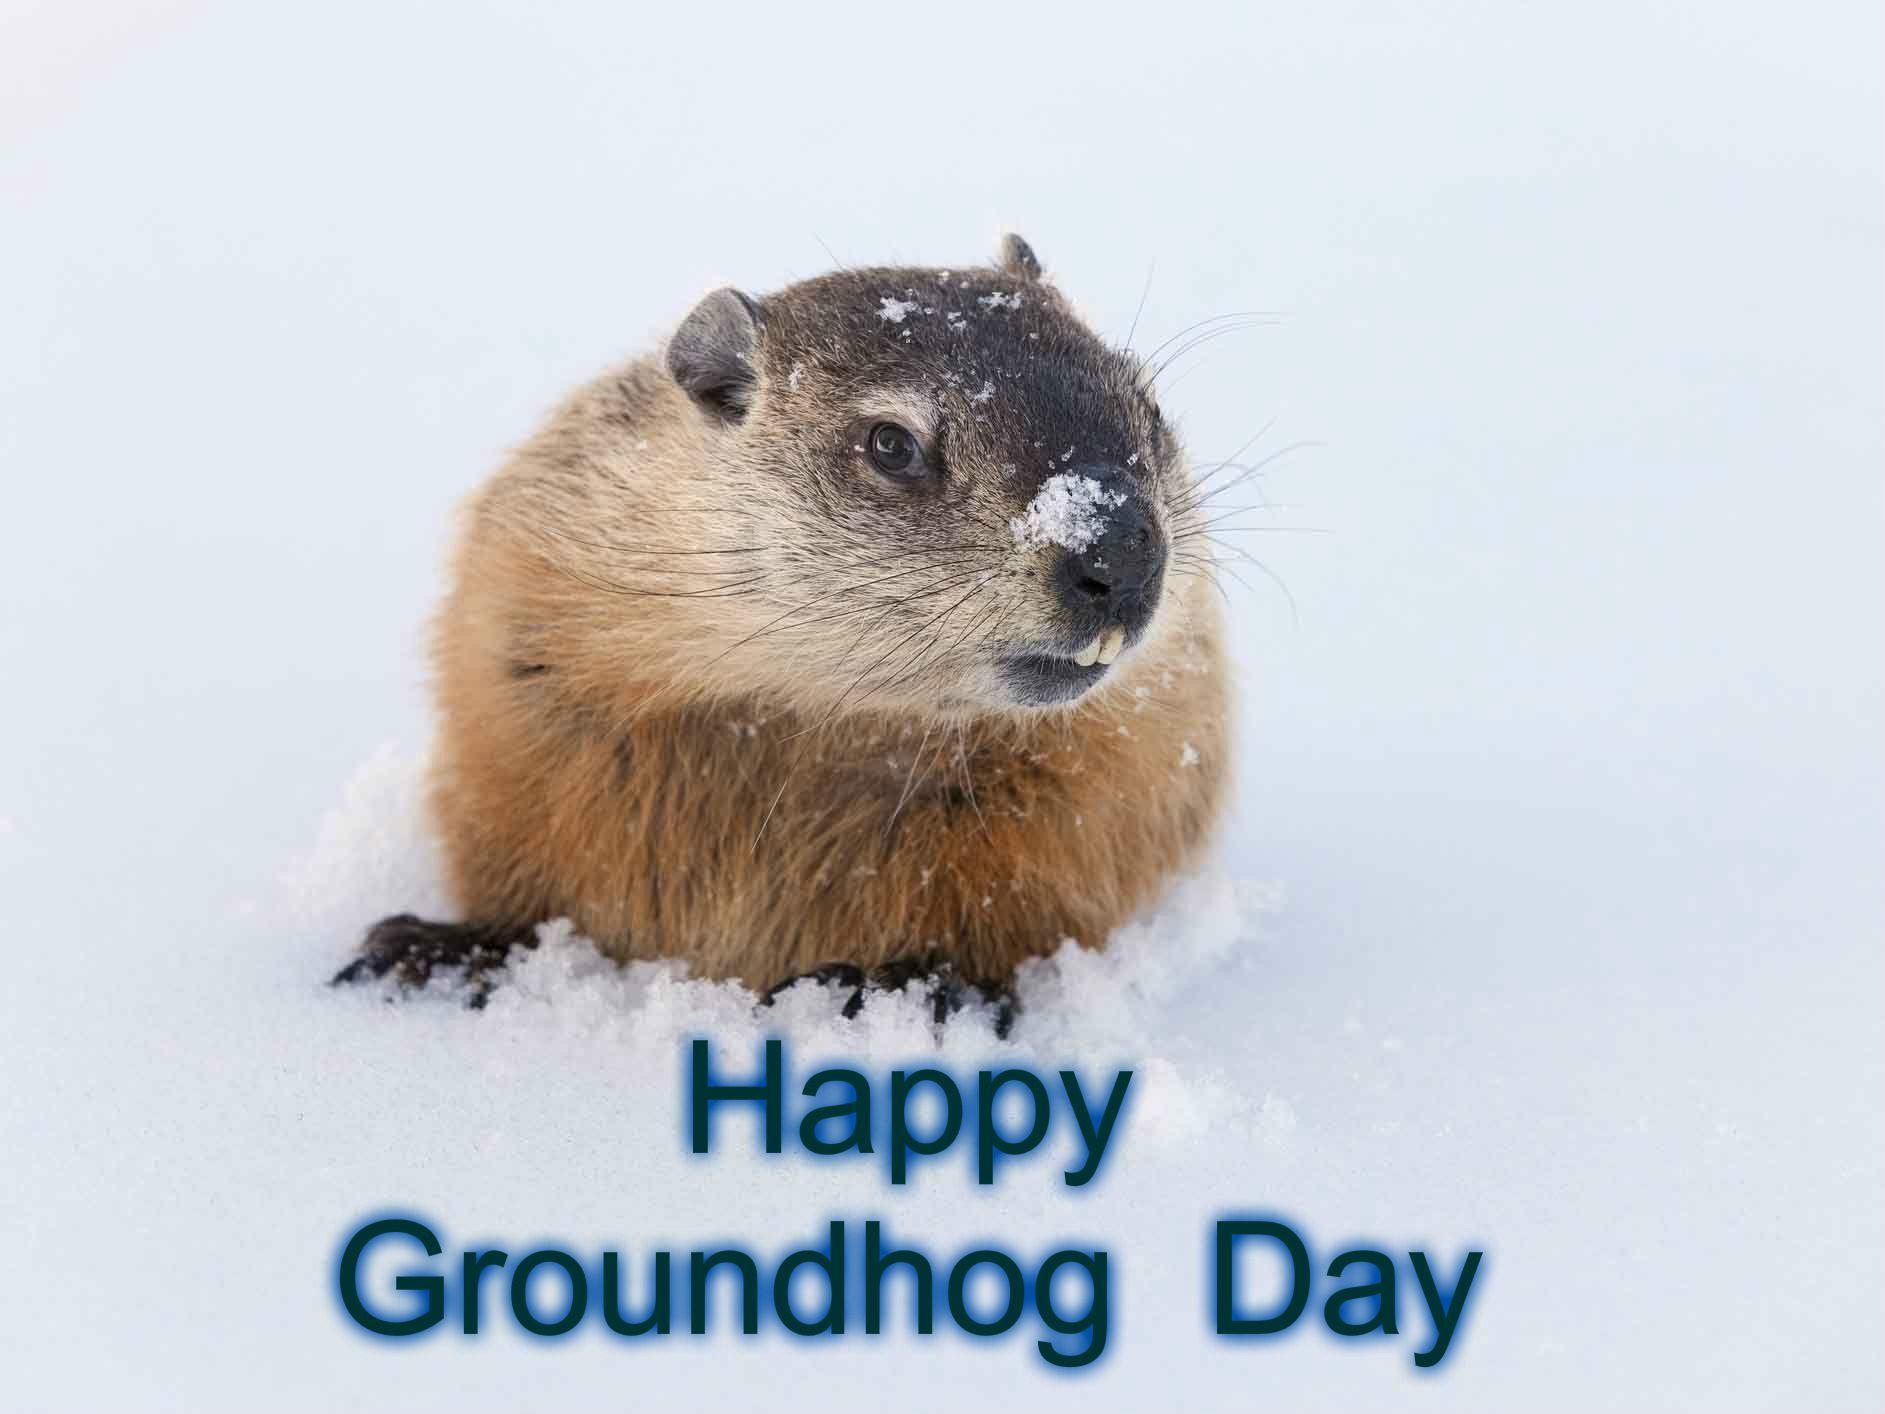 Groundhog Day Treats Groundhogday Groundhog Day Happy Groundhog Day Inspirational Quotes God